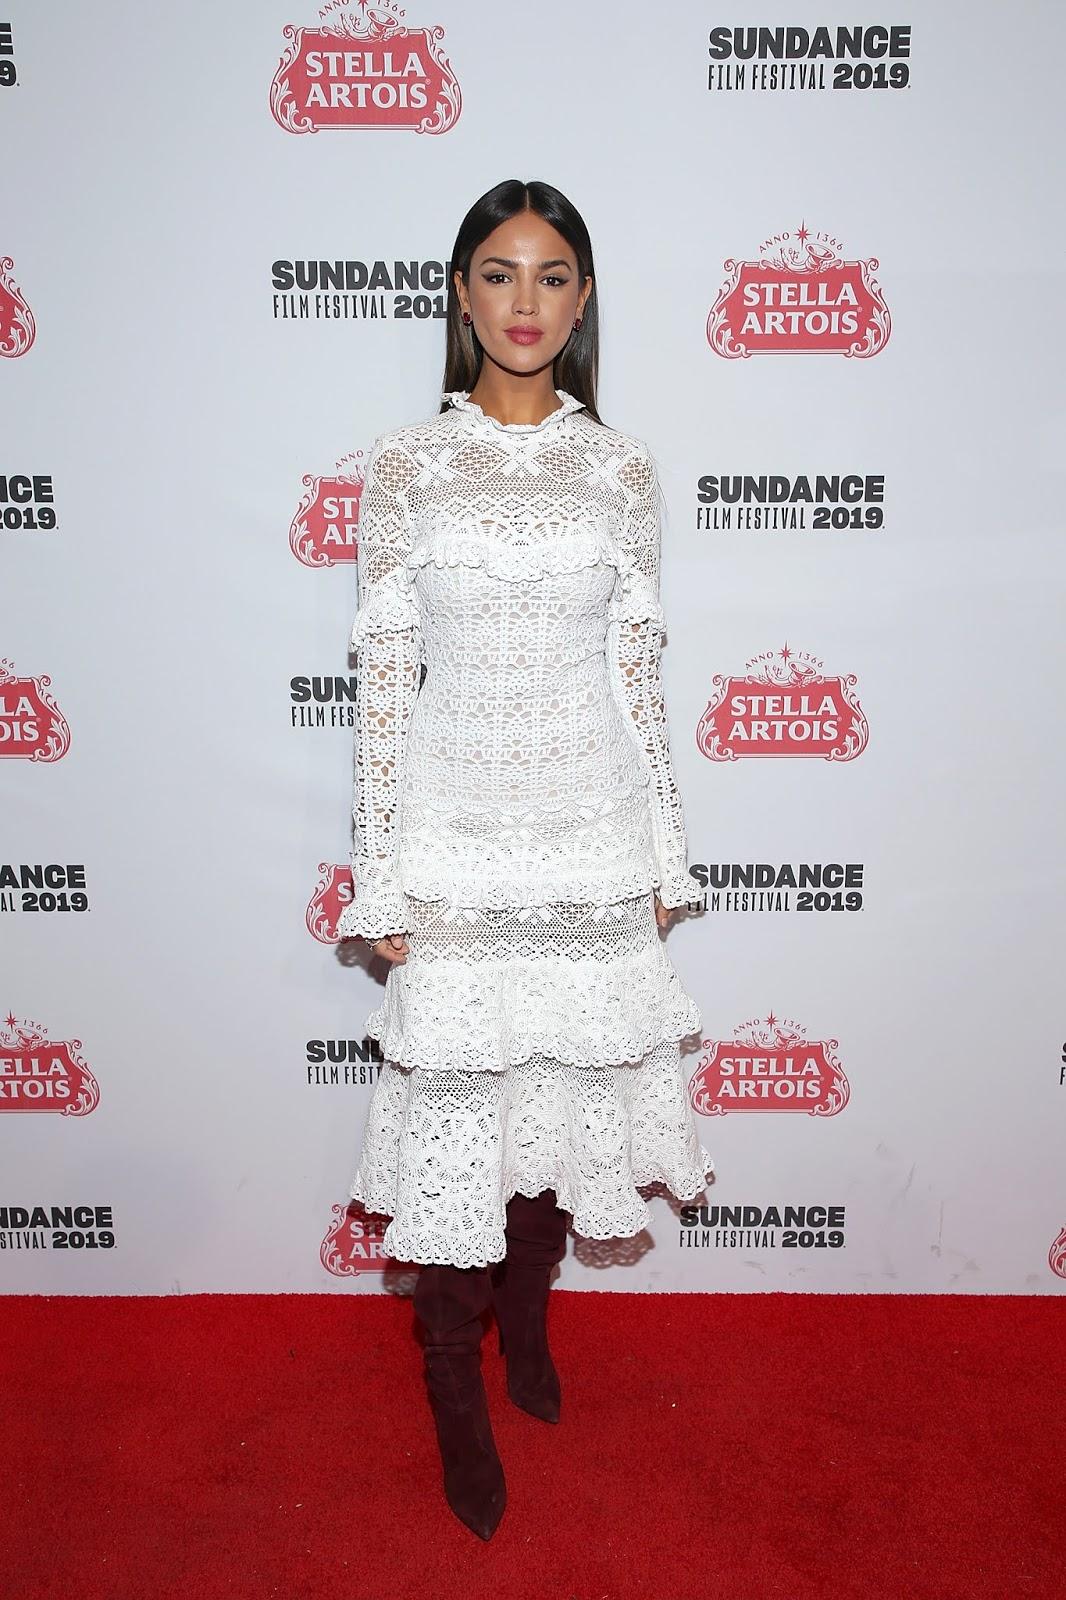 Eiza Gonzalez - Sundance Film Festival in Park City, Utah - 02/01/2019